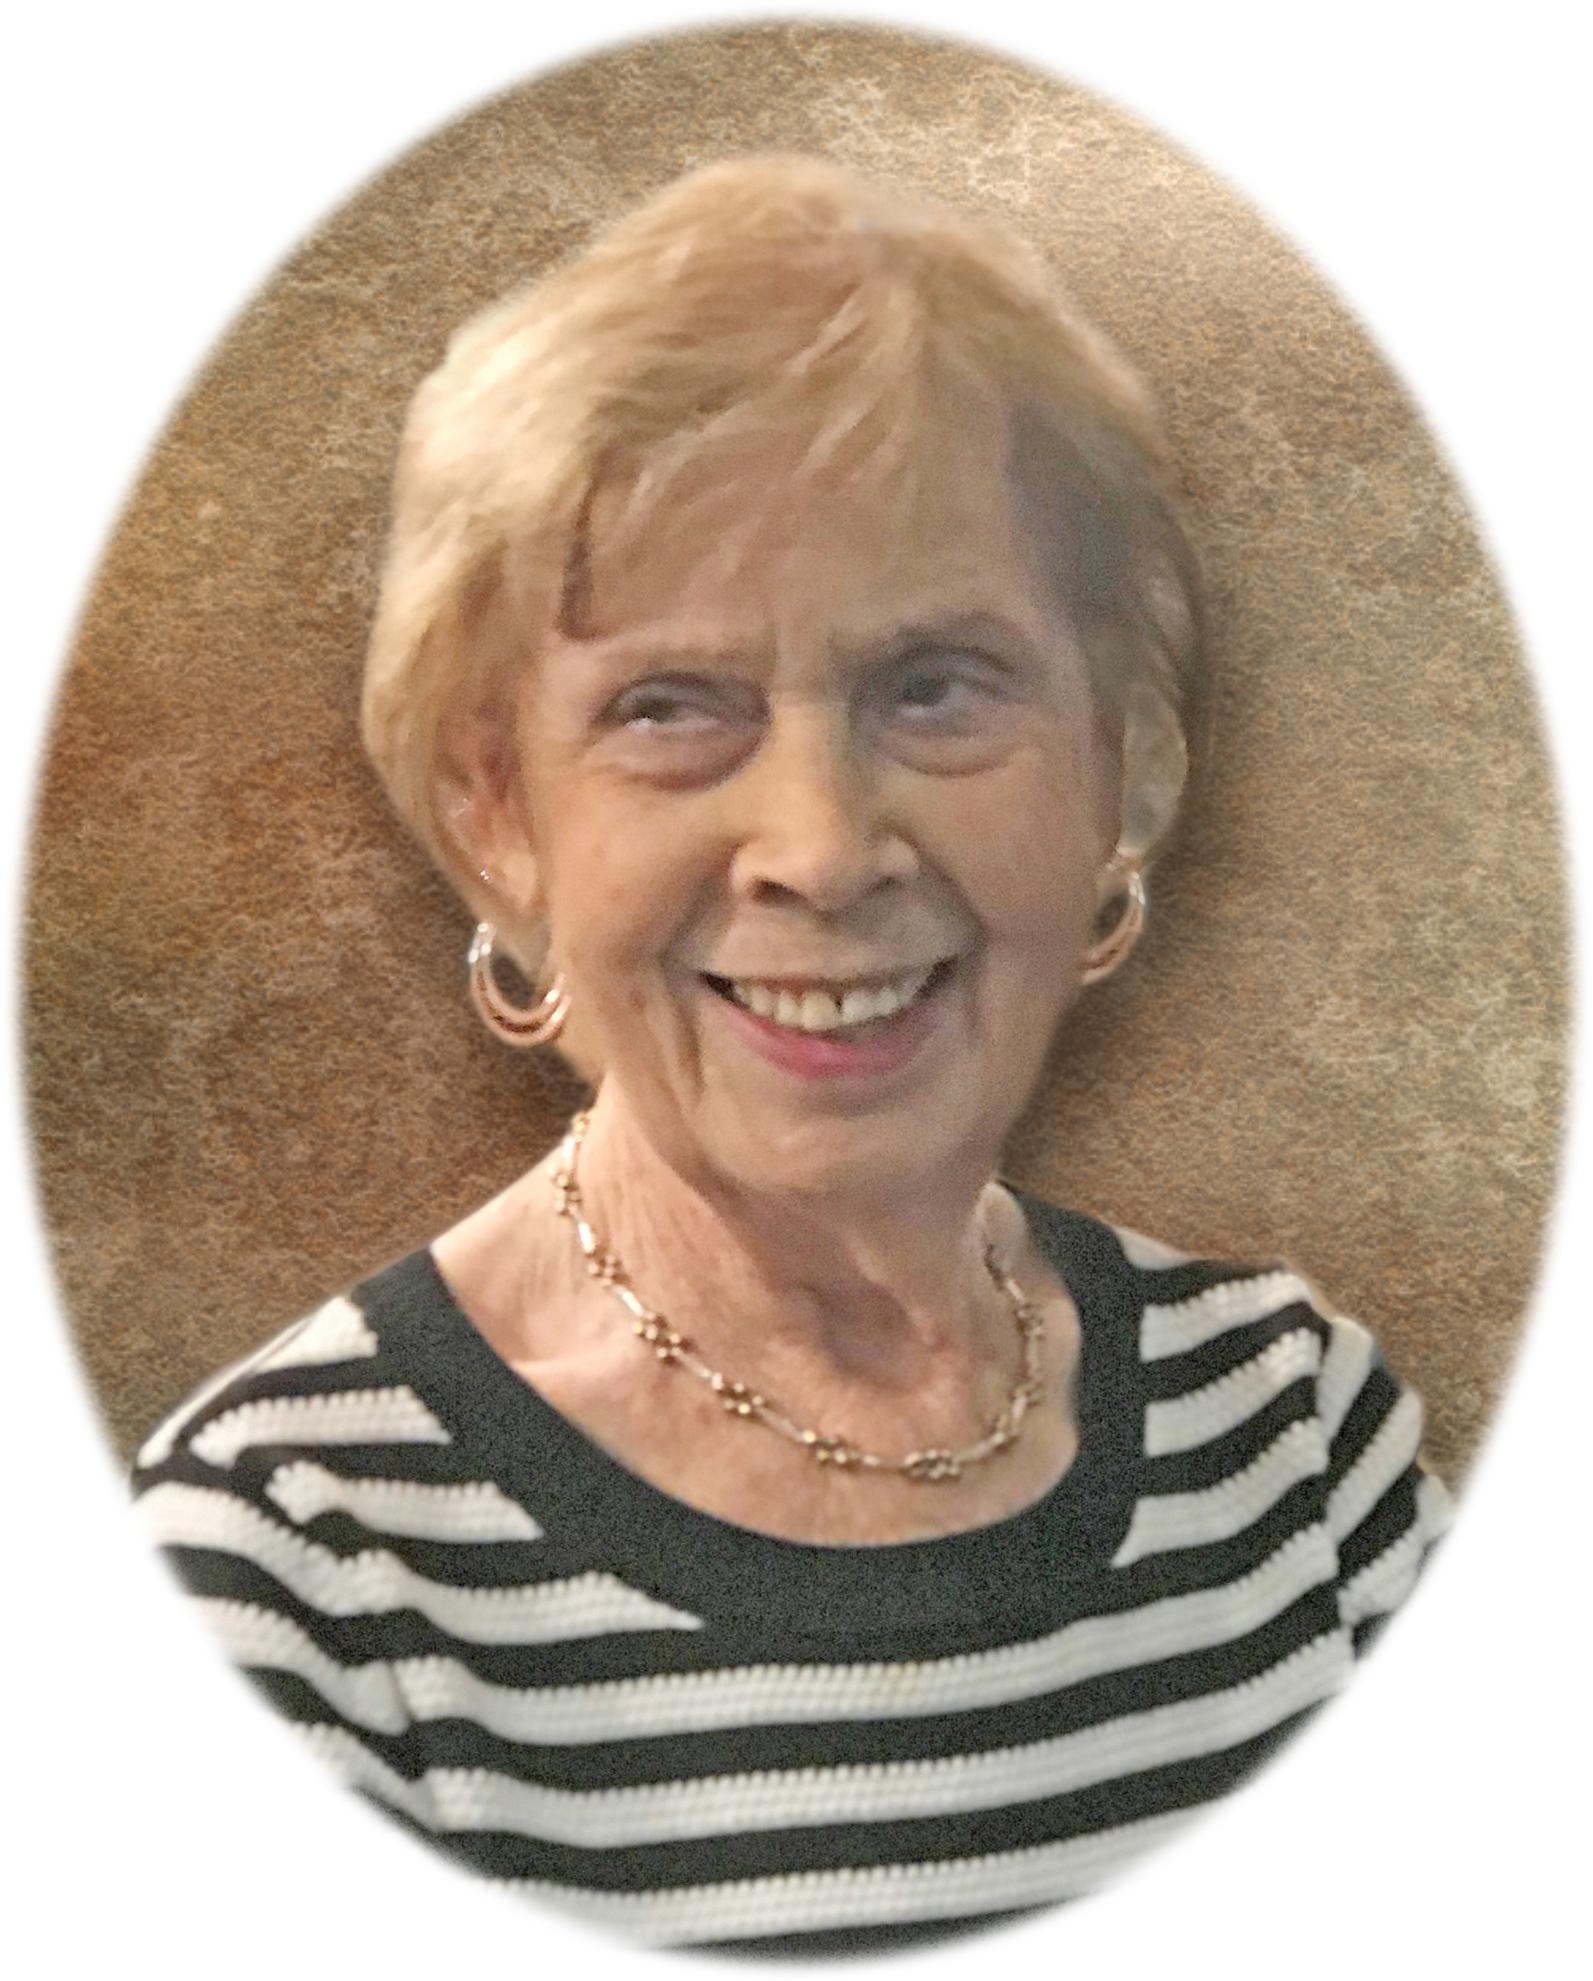 Patricia L. Meyer